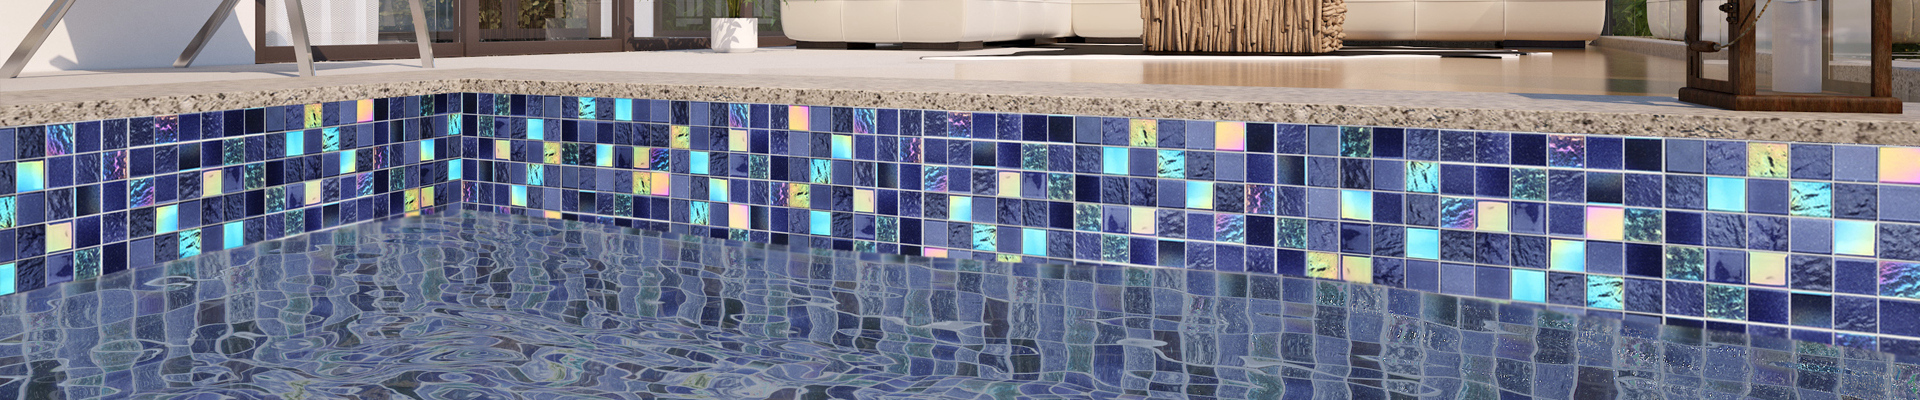 video-green glass mosaic pool tiles wholesale for bathroom Heng Xing-Heng Xing-img